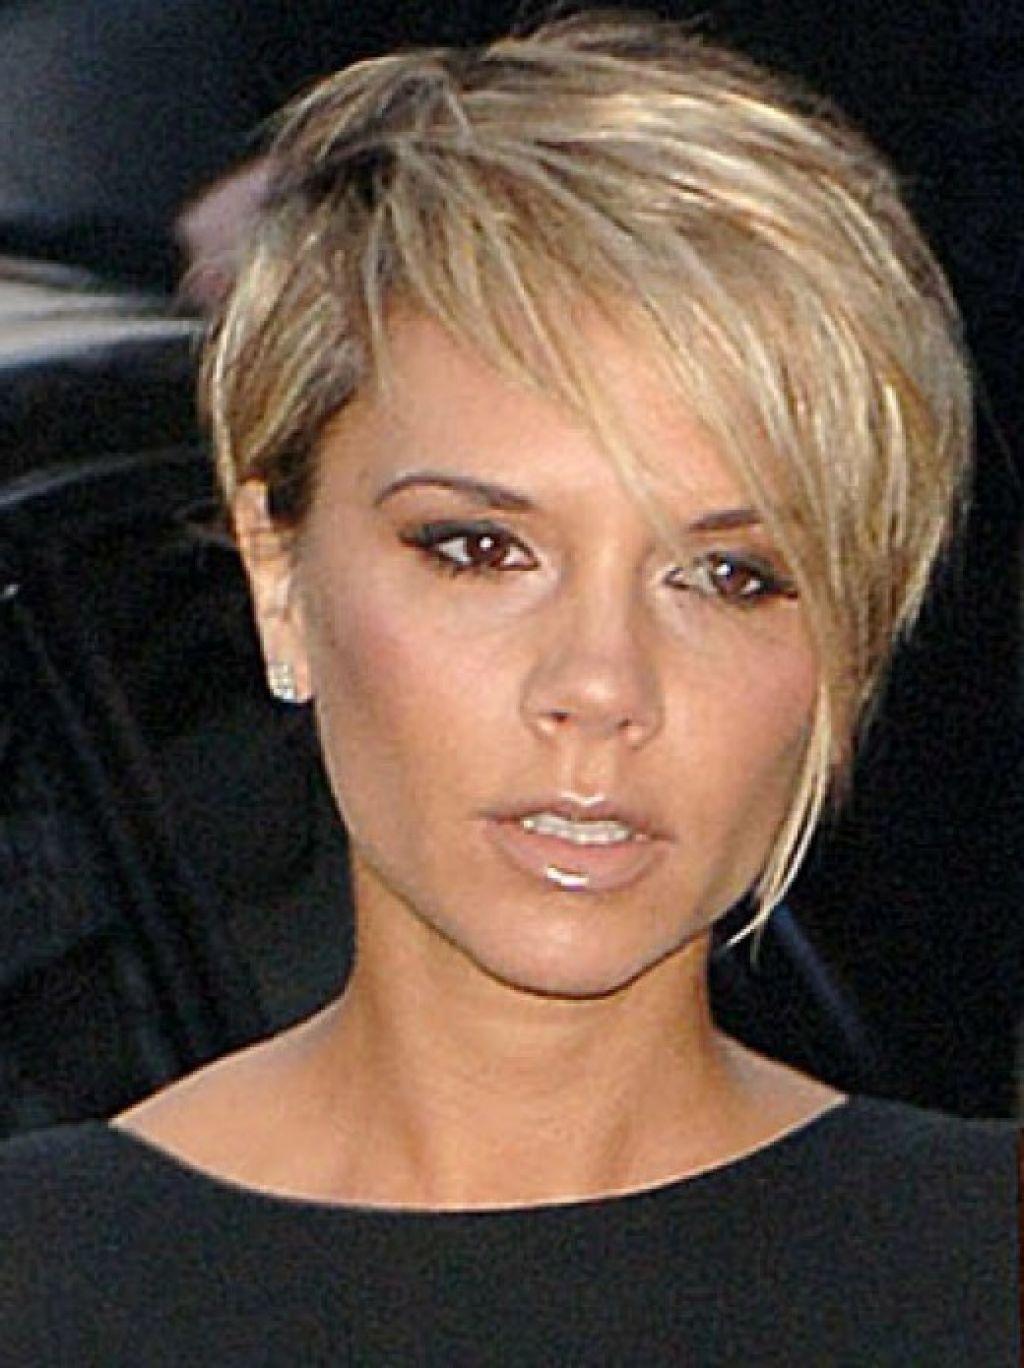 Victoria Beckham Pixie Cut Blonde Google Search Coiffure